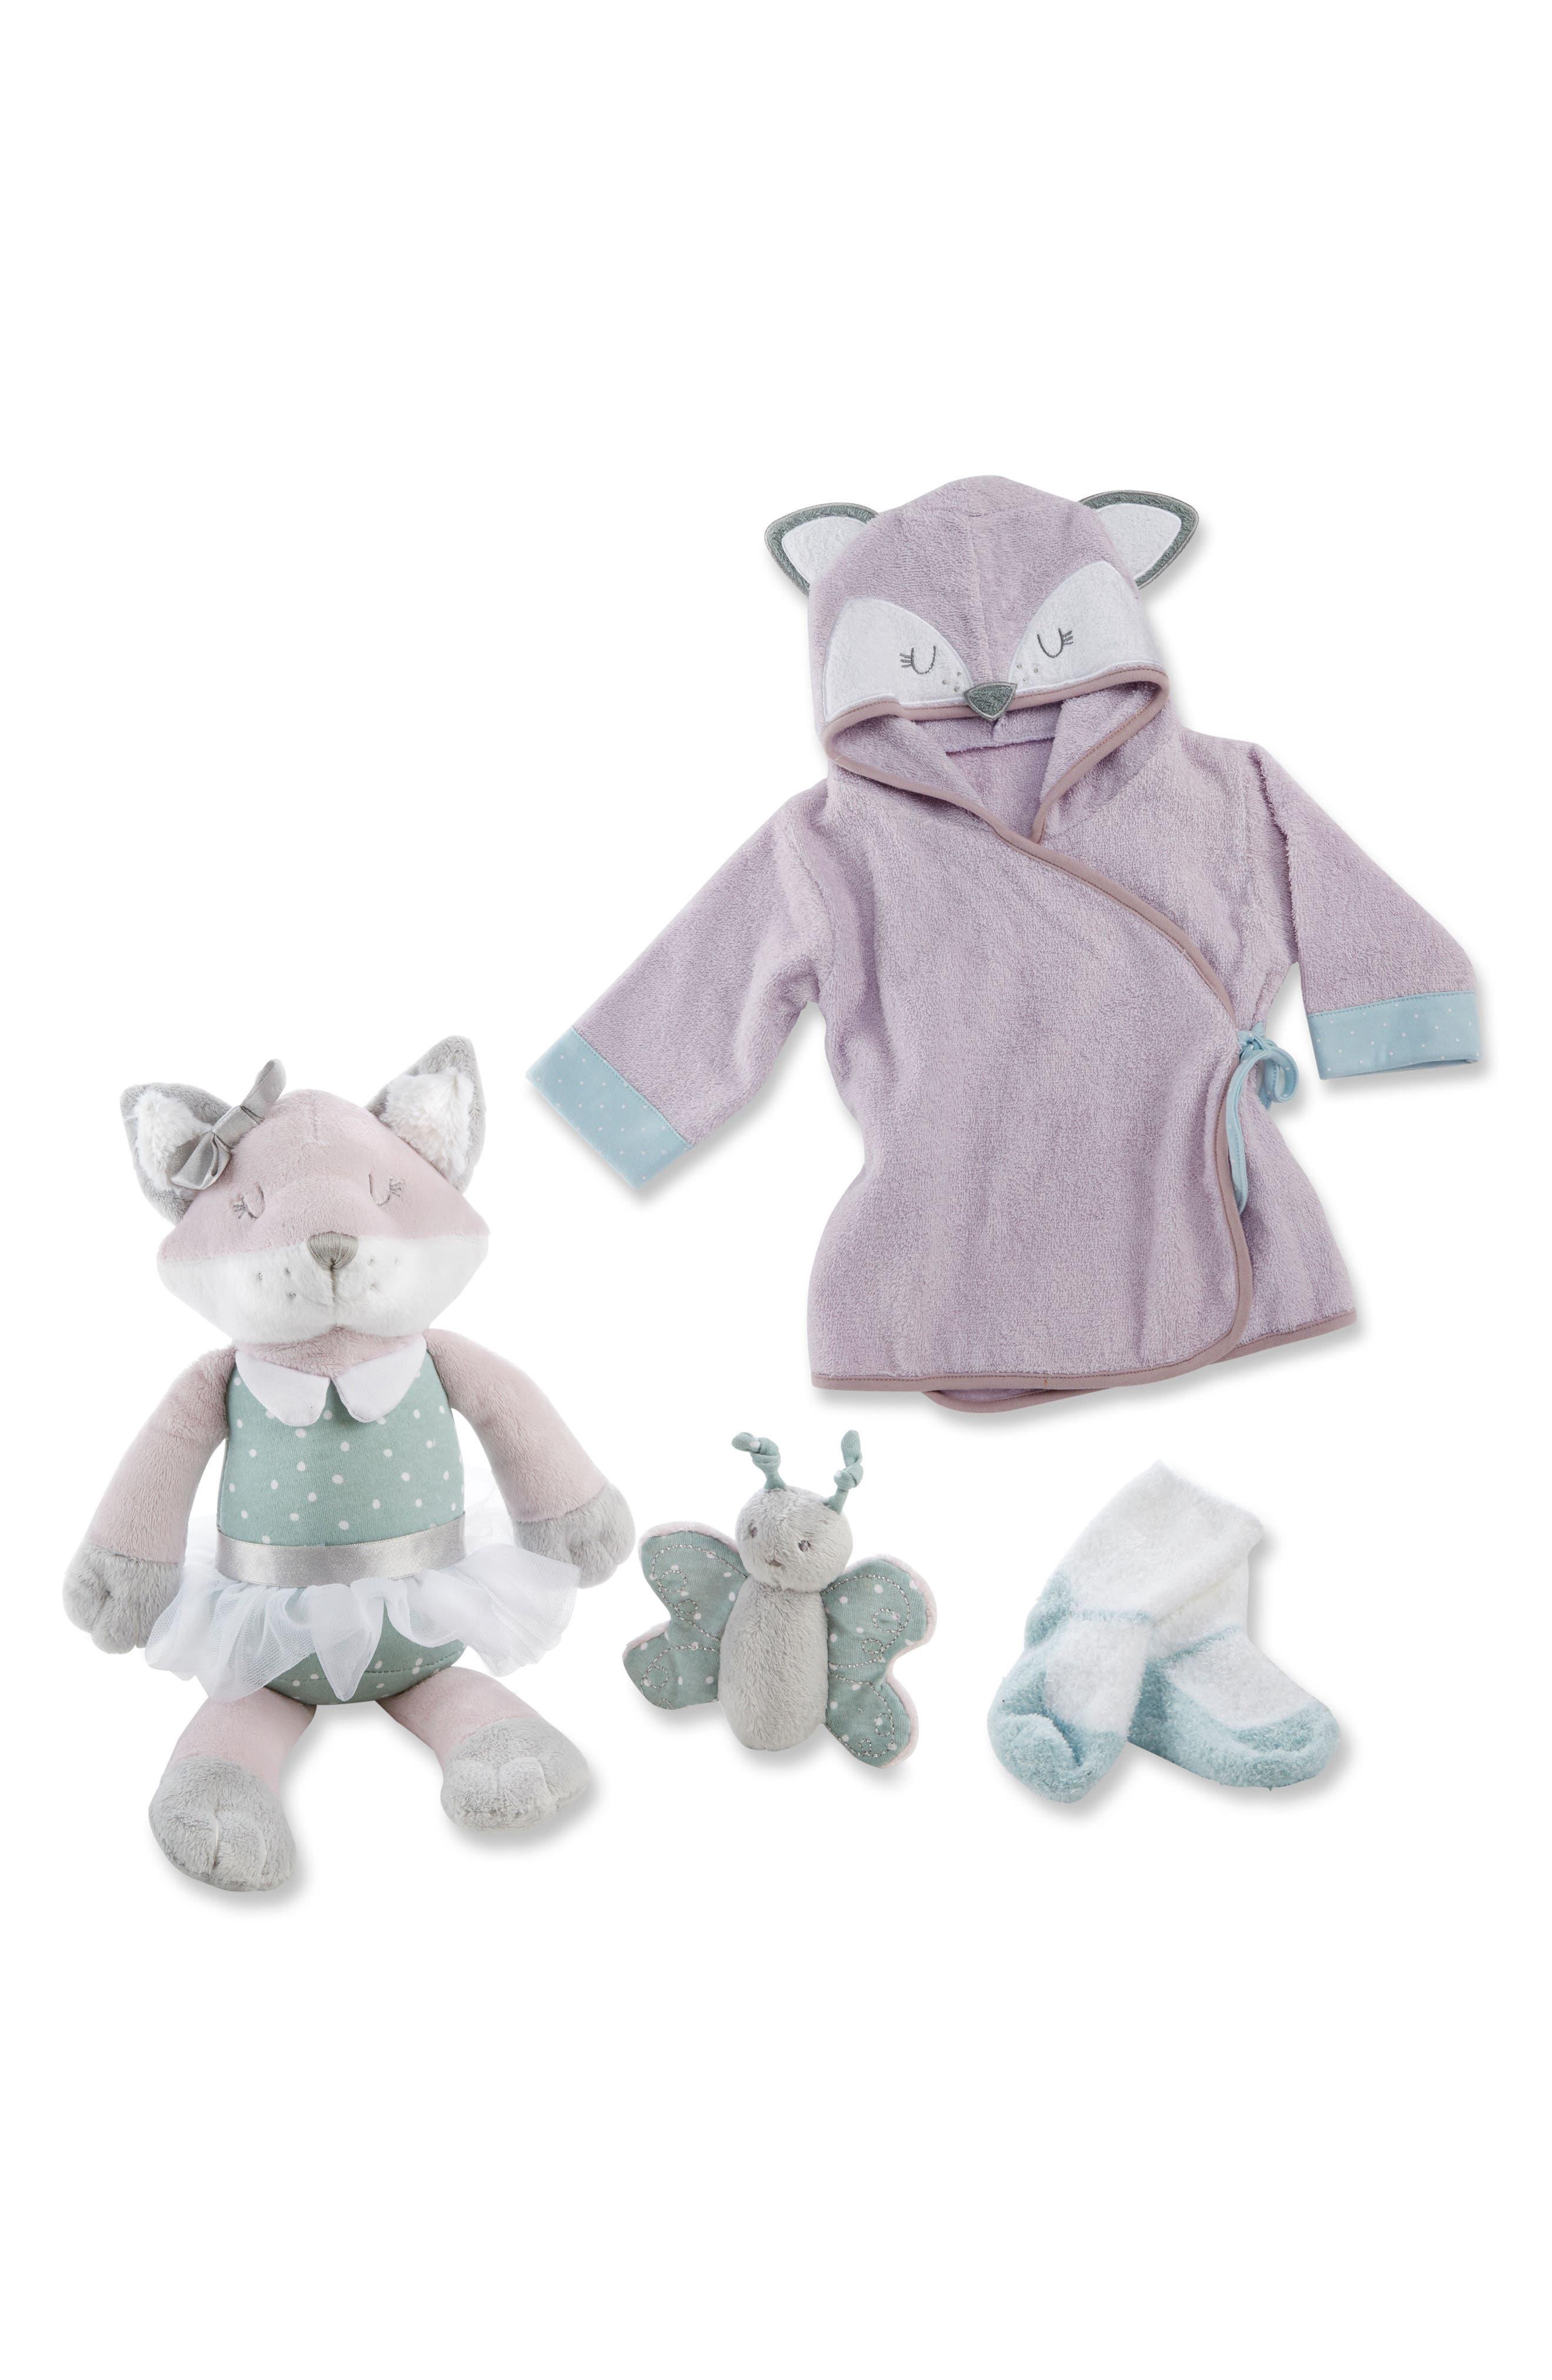 Baby Aspen Forest Friends Fox Plush Robe, Fuzzy Socks, Stuffed Animal & Rattle Set (Baby)